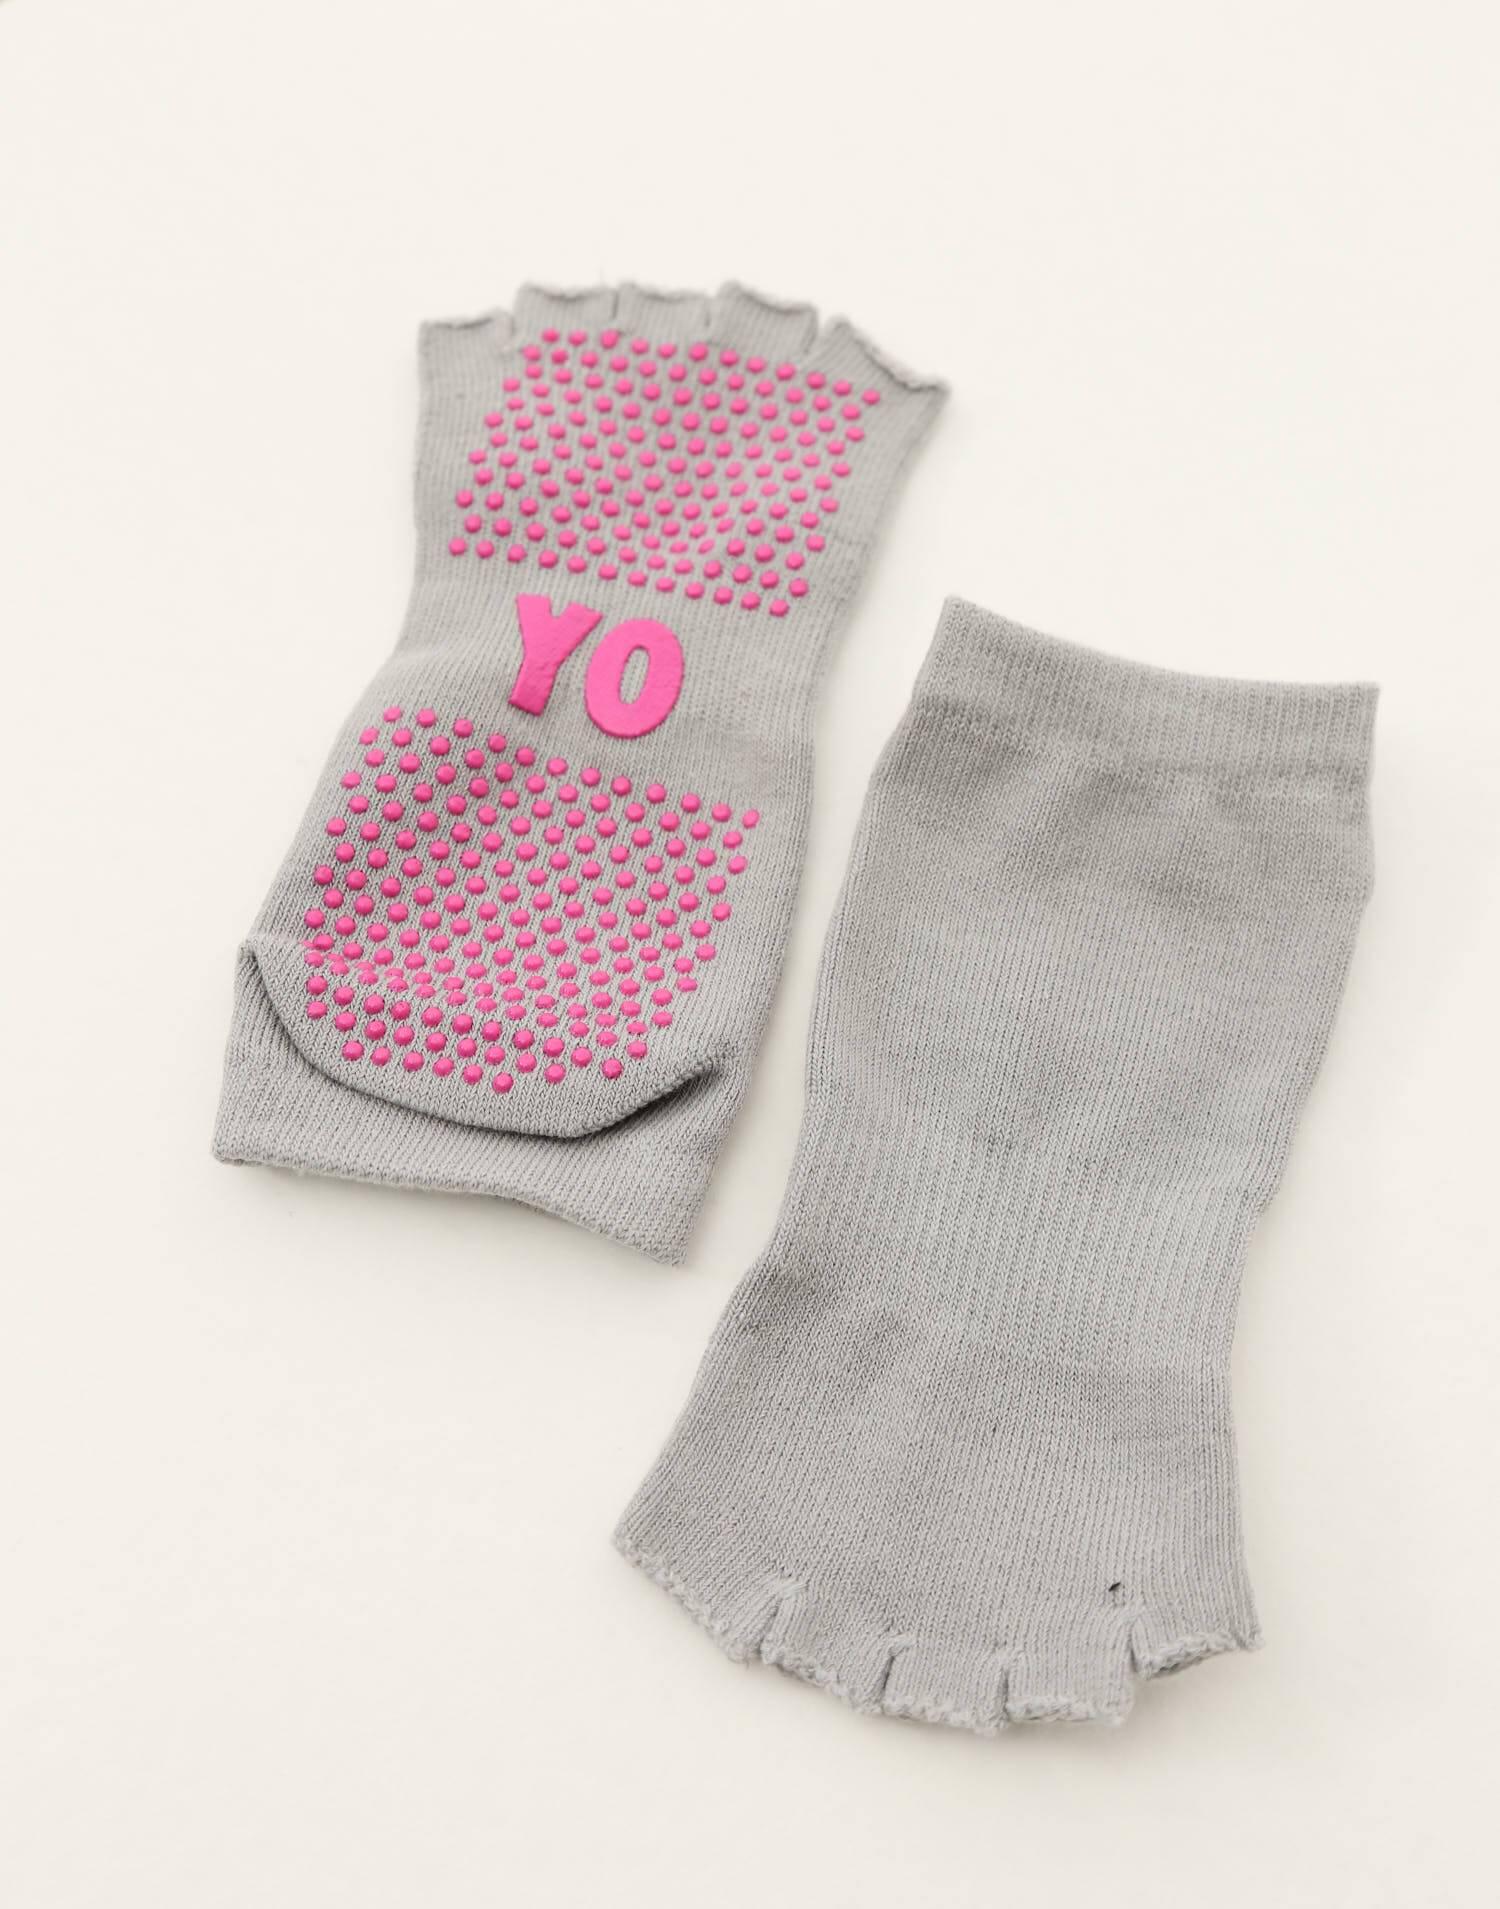 Yo-gui yoga socks